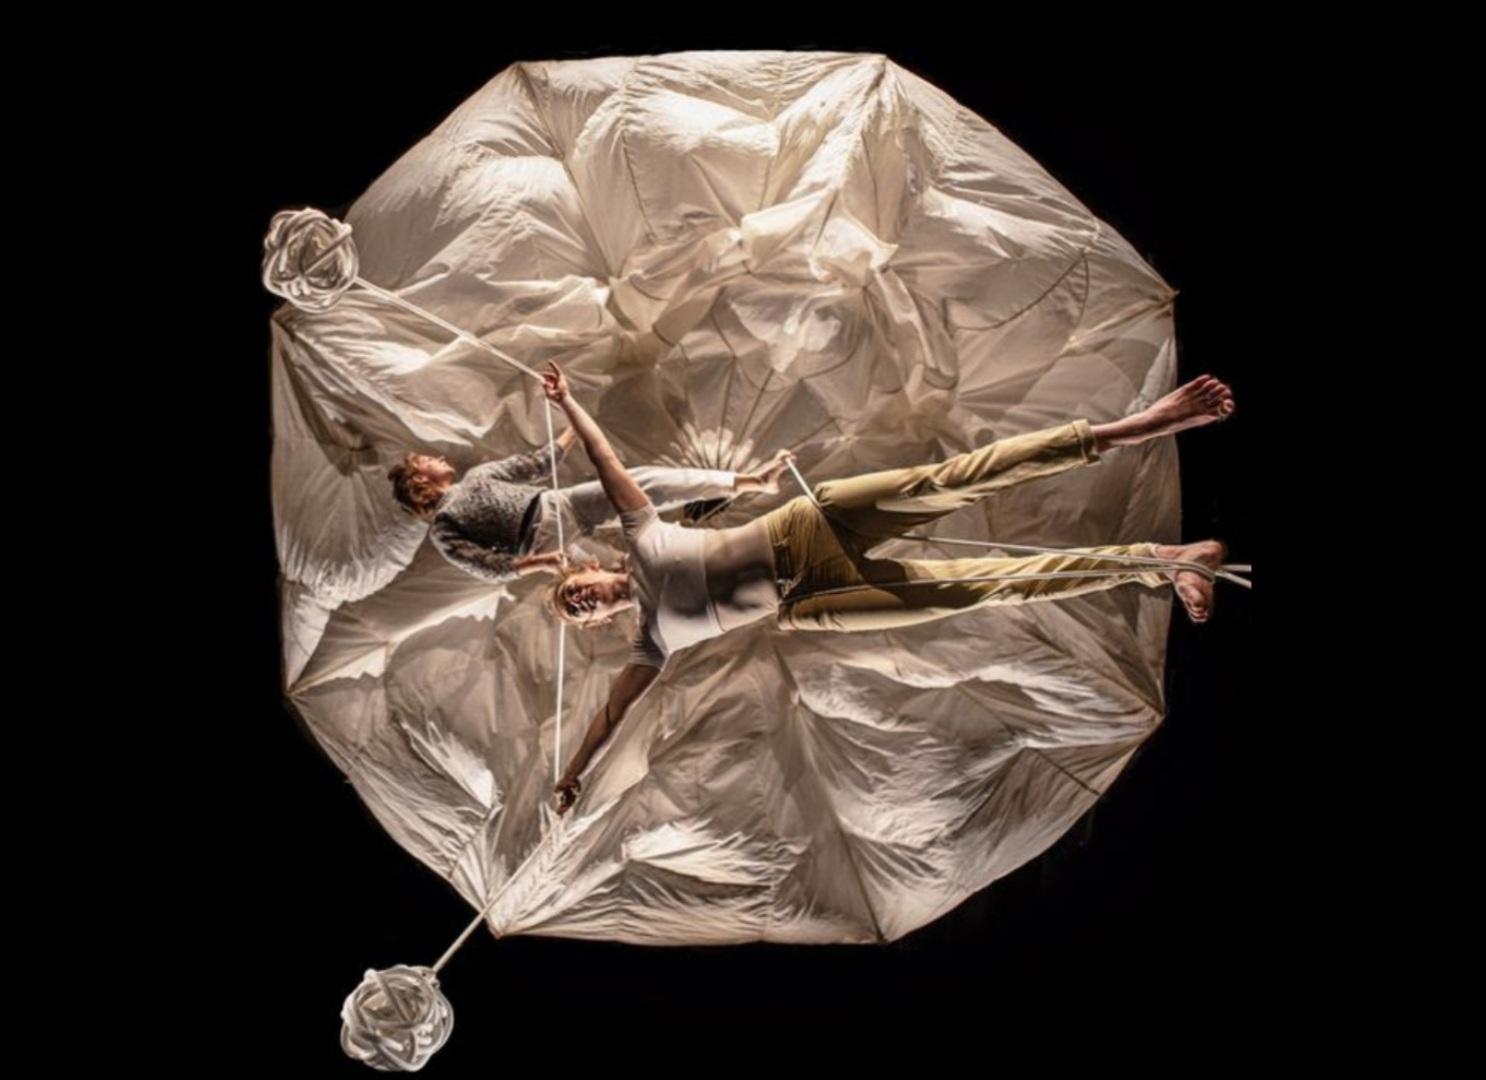 Grupo Archaor realiza 4ª Bienal do Circo na França